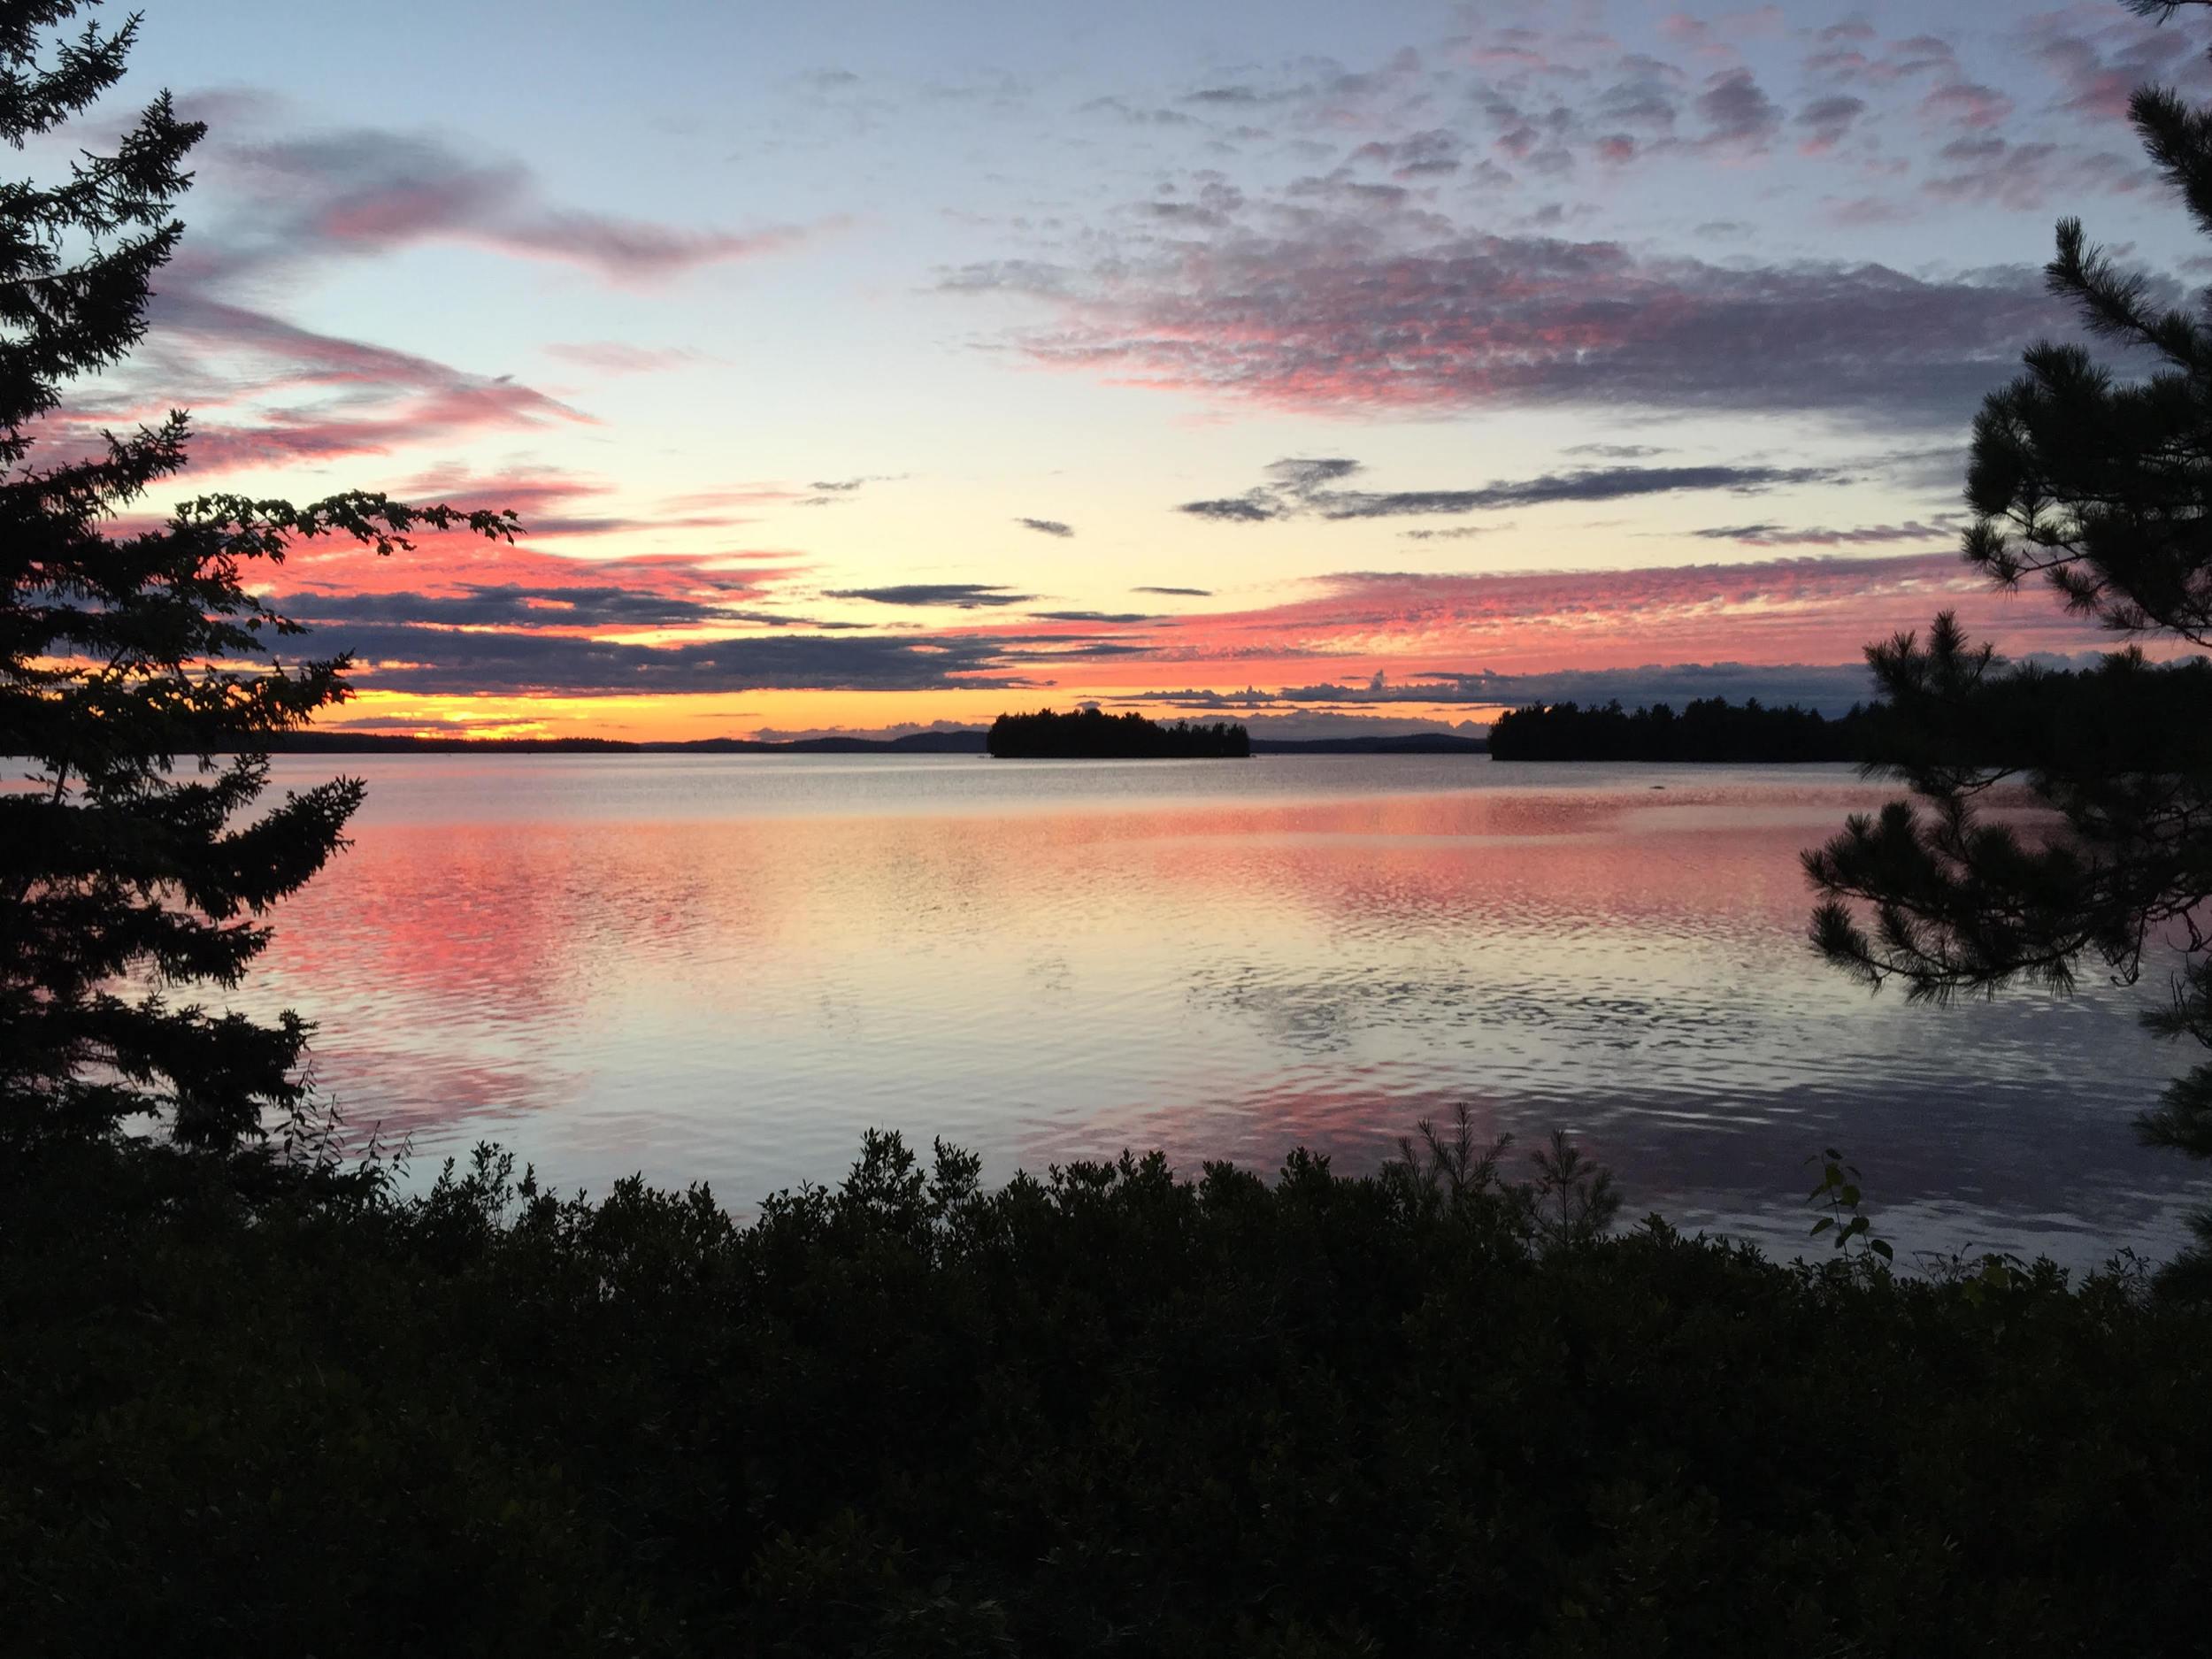 Sunset over Grand Lake Stream, Leen's Lodge, Maine, USA